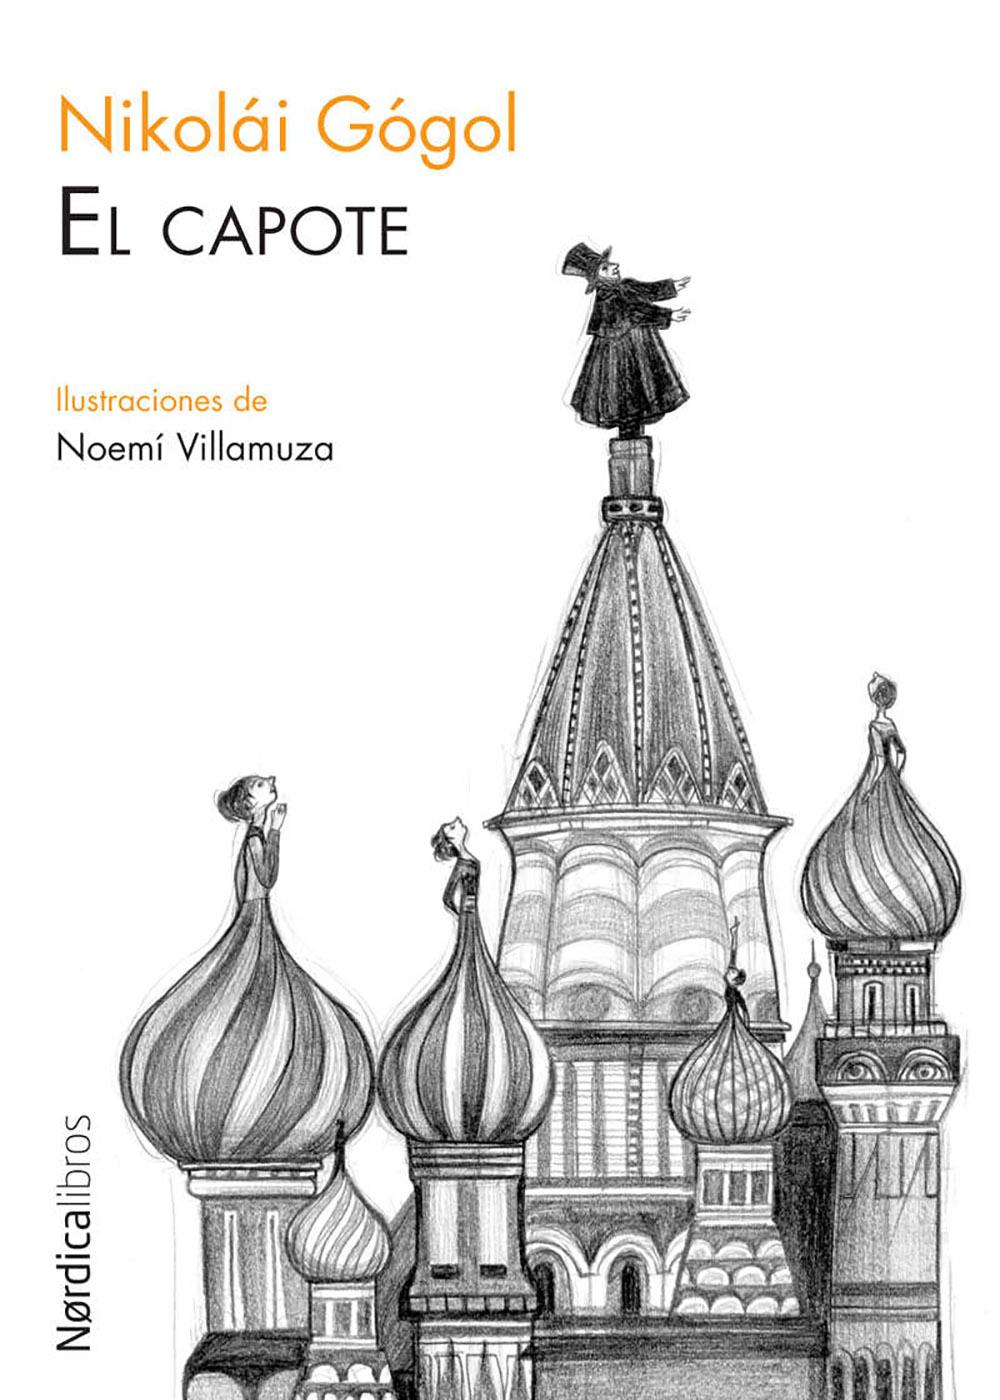 Nikolai Gogol - El capote